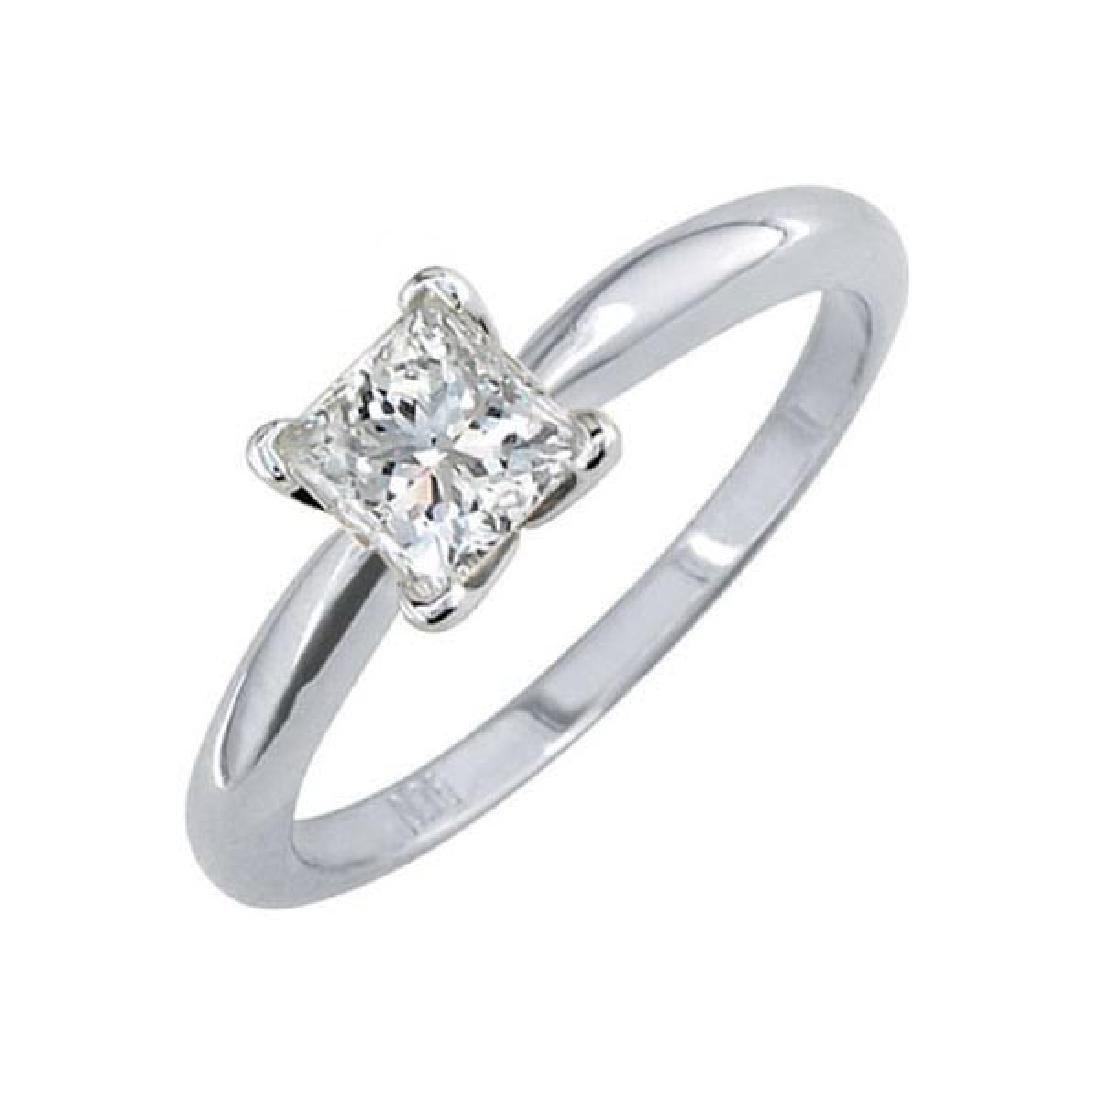 Certified 0.57 CTW Princess Diamond Solitaire 14k Ring